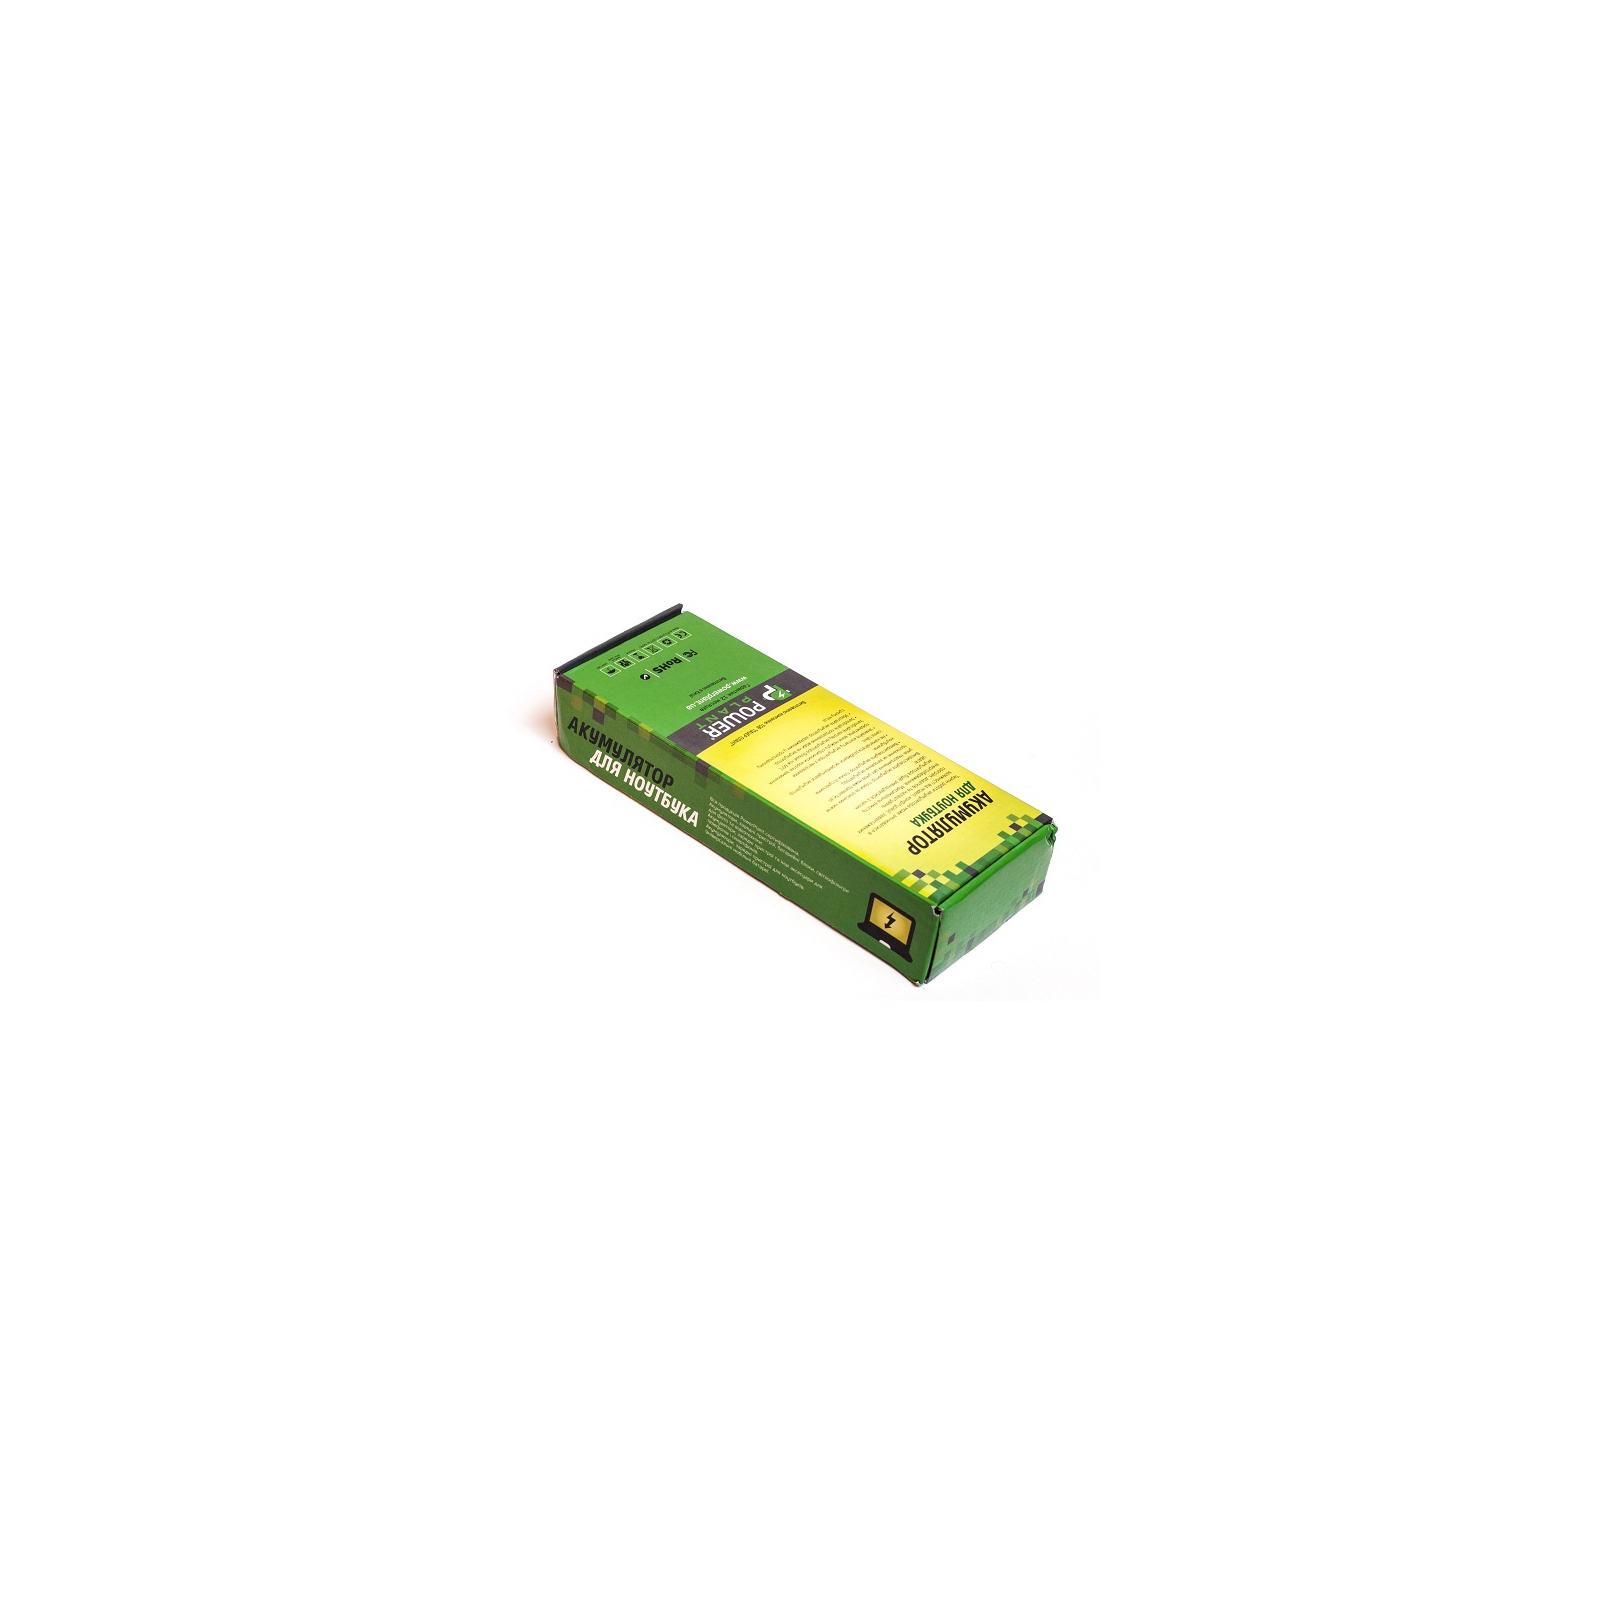 Аккумулятор для ноутбука SONY VAIO PCG-505 (PCGA-BP51) 11,1V 2200mAh PowerPlant (NB00000193) изображение 2